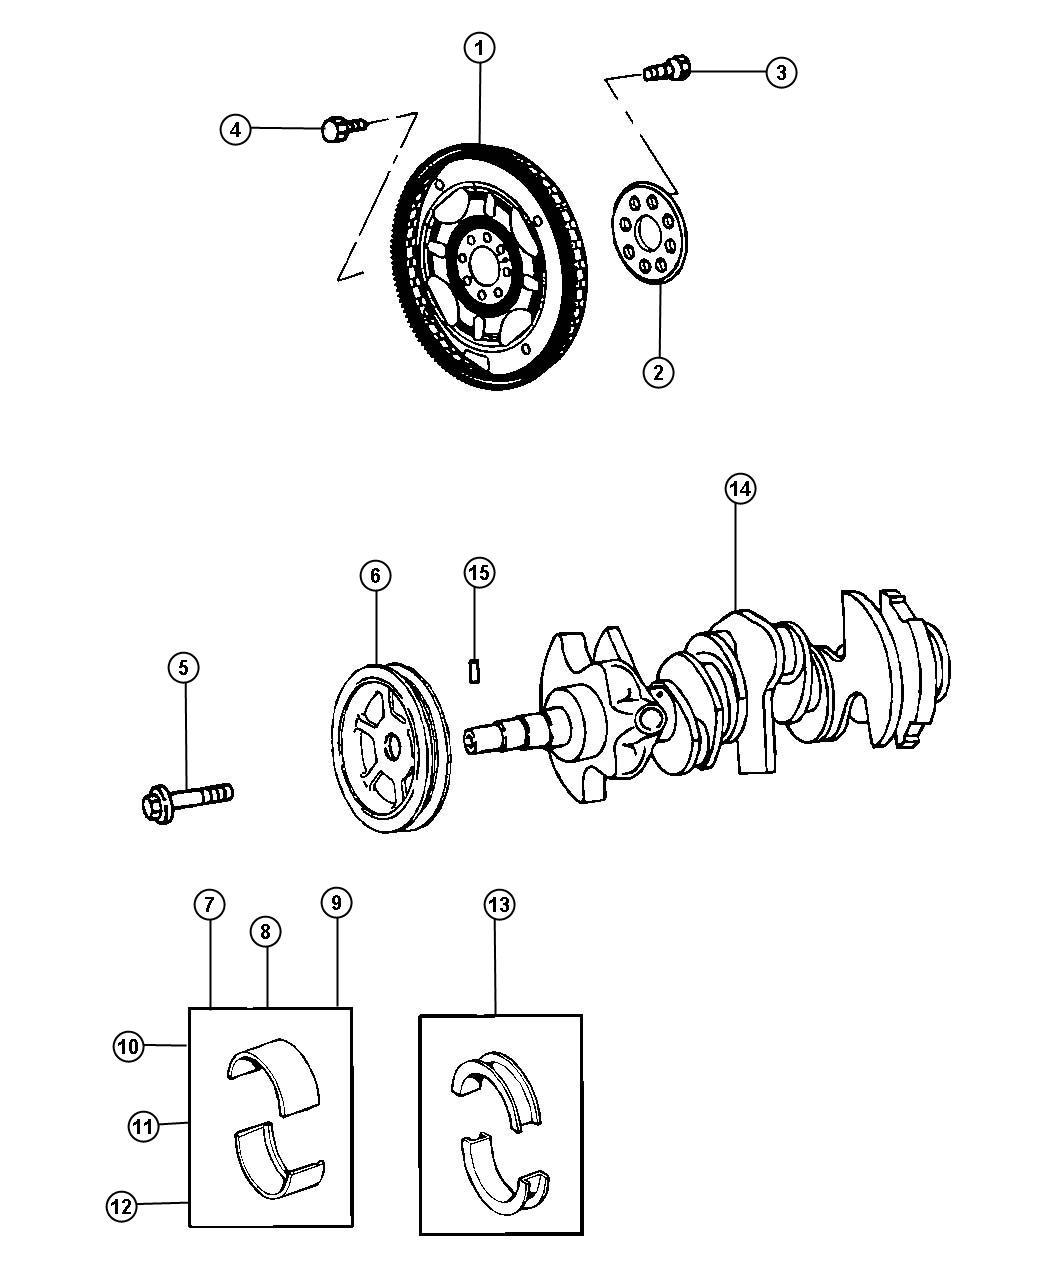 2008 Chrysler Town & Country Bearing. Crankshaft thrust